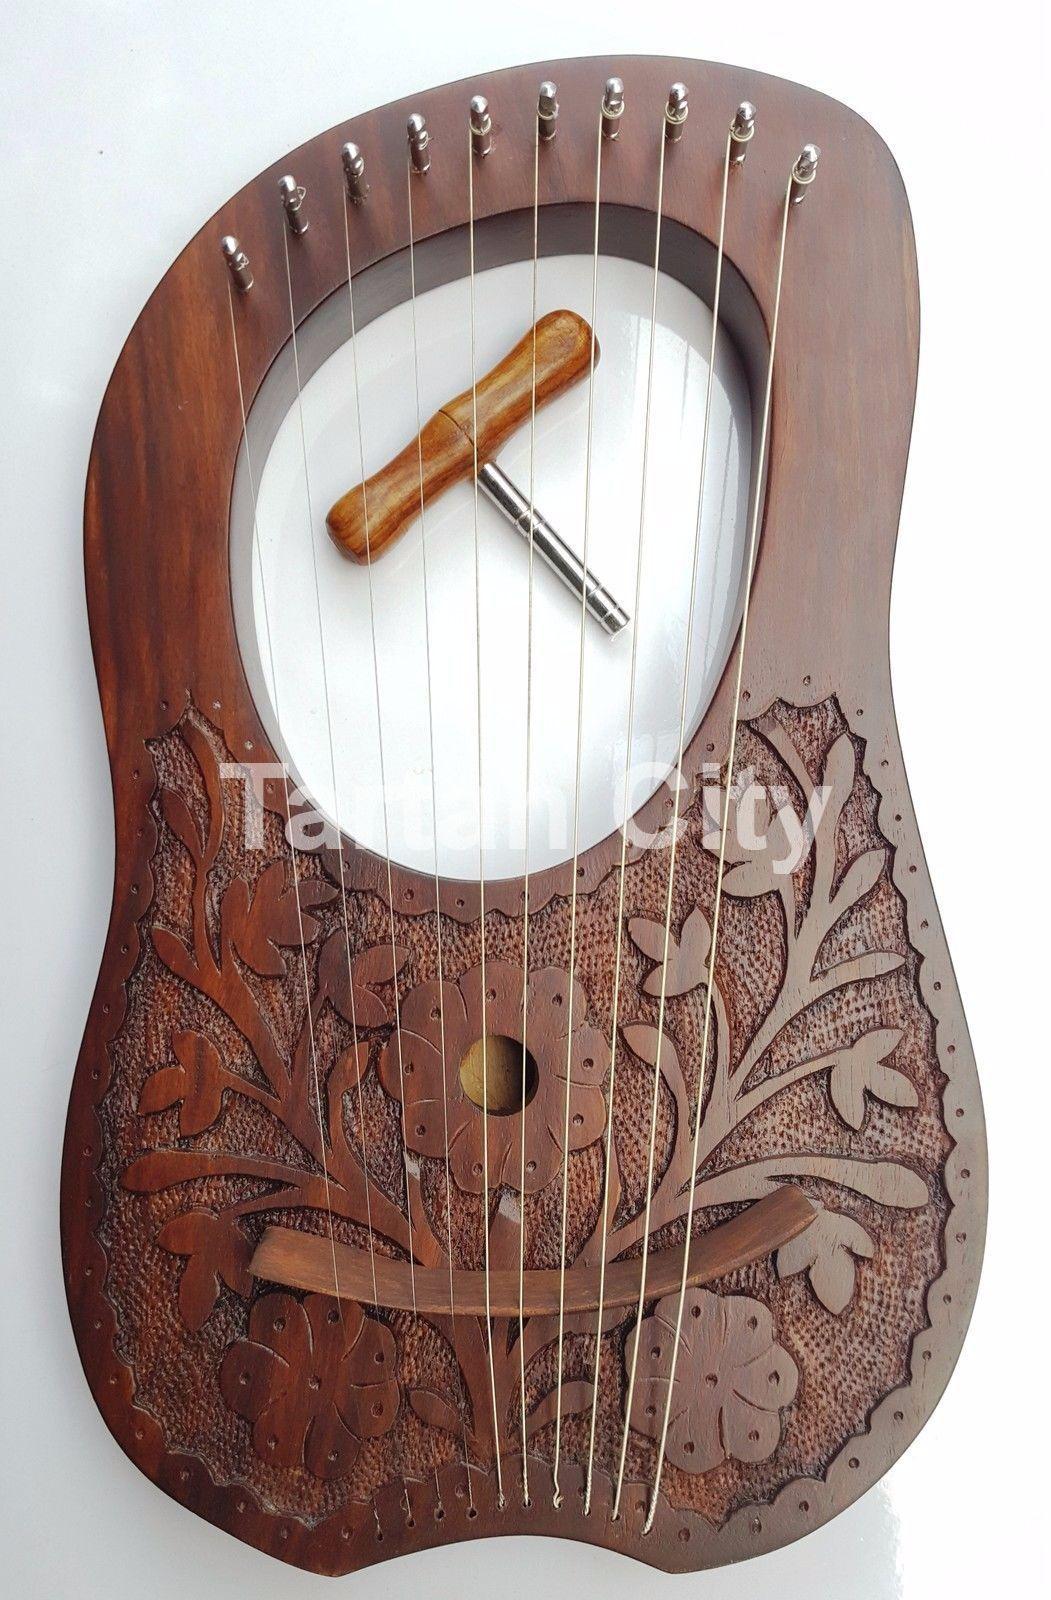 Neu Lyra Mundharmonika 10 Metall Saiten Palisanderholz Hand Graviert Natürliche